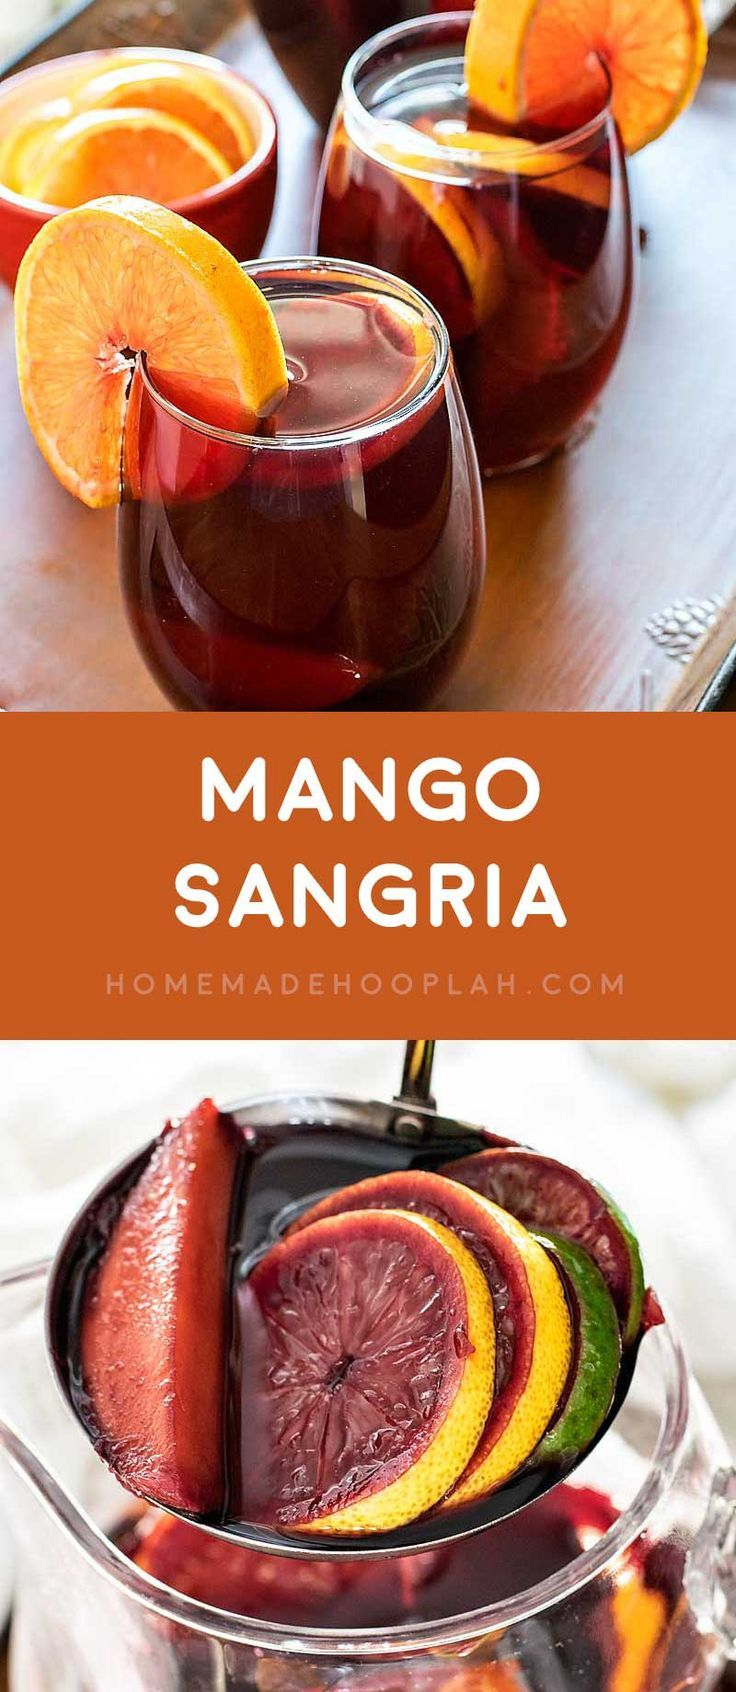 Mango Sangria Delicious Mango Sangria With Sweet Red Wine Infused With Mango Orange Lemon And Li Mango Sangria Sweet Red Sangria Recipe Red Sangria Recipes